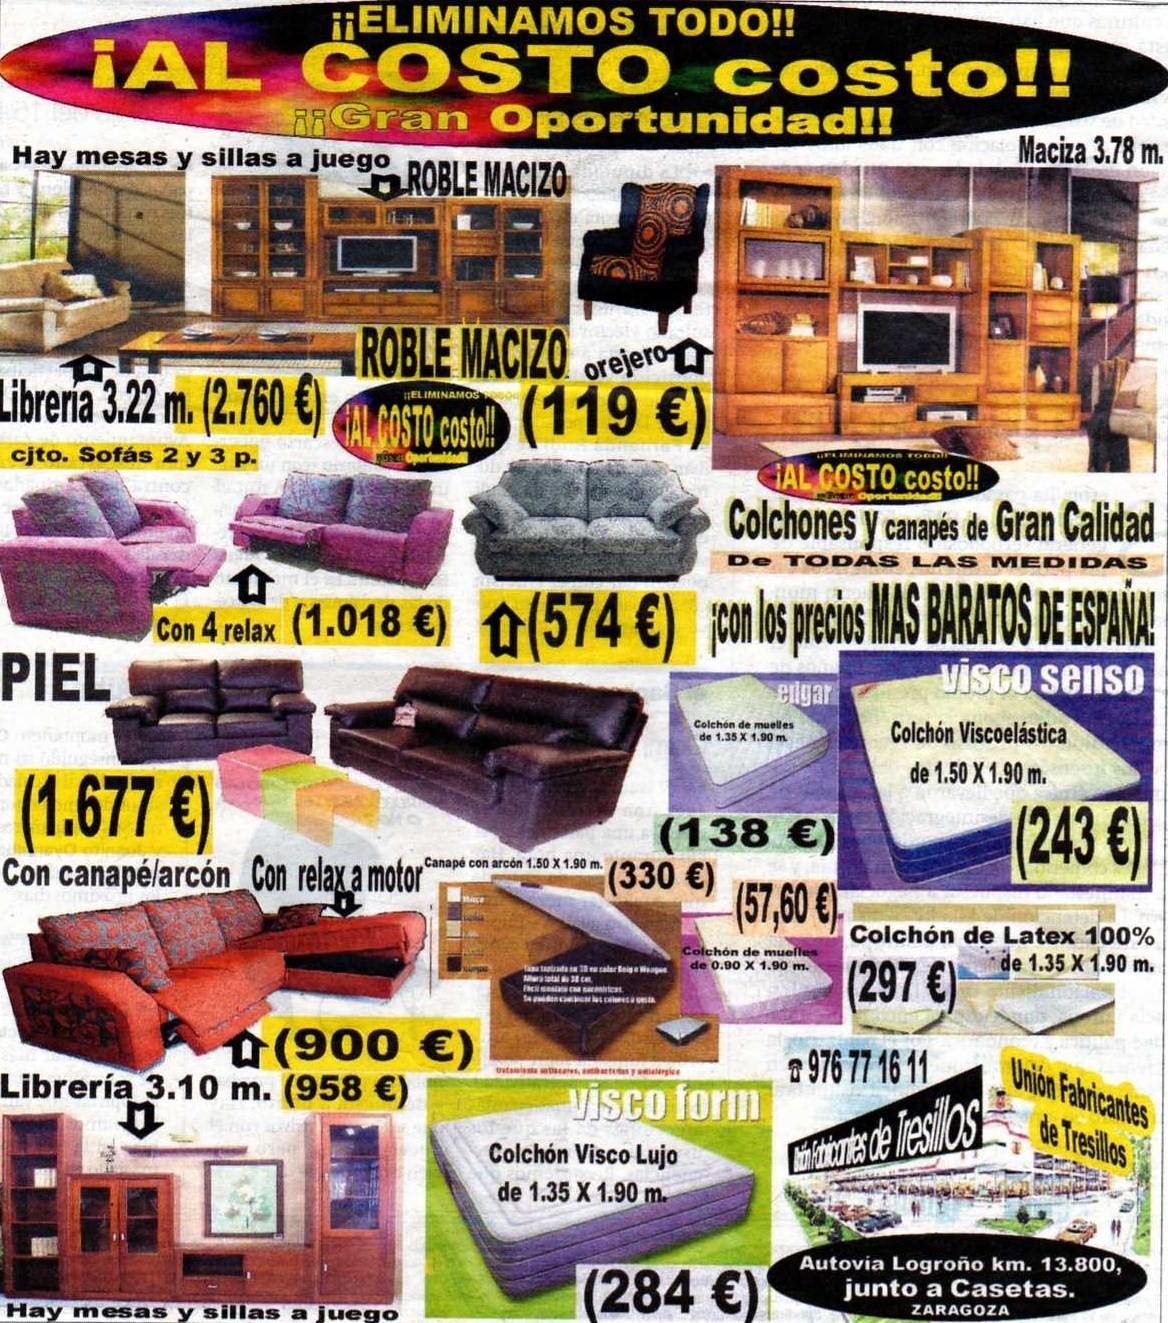 uni n fabricantes de tresillos mayo 2011